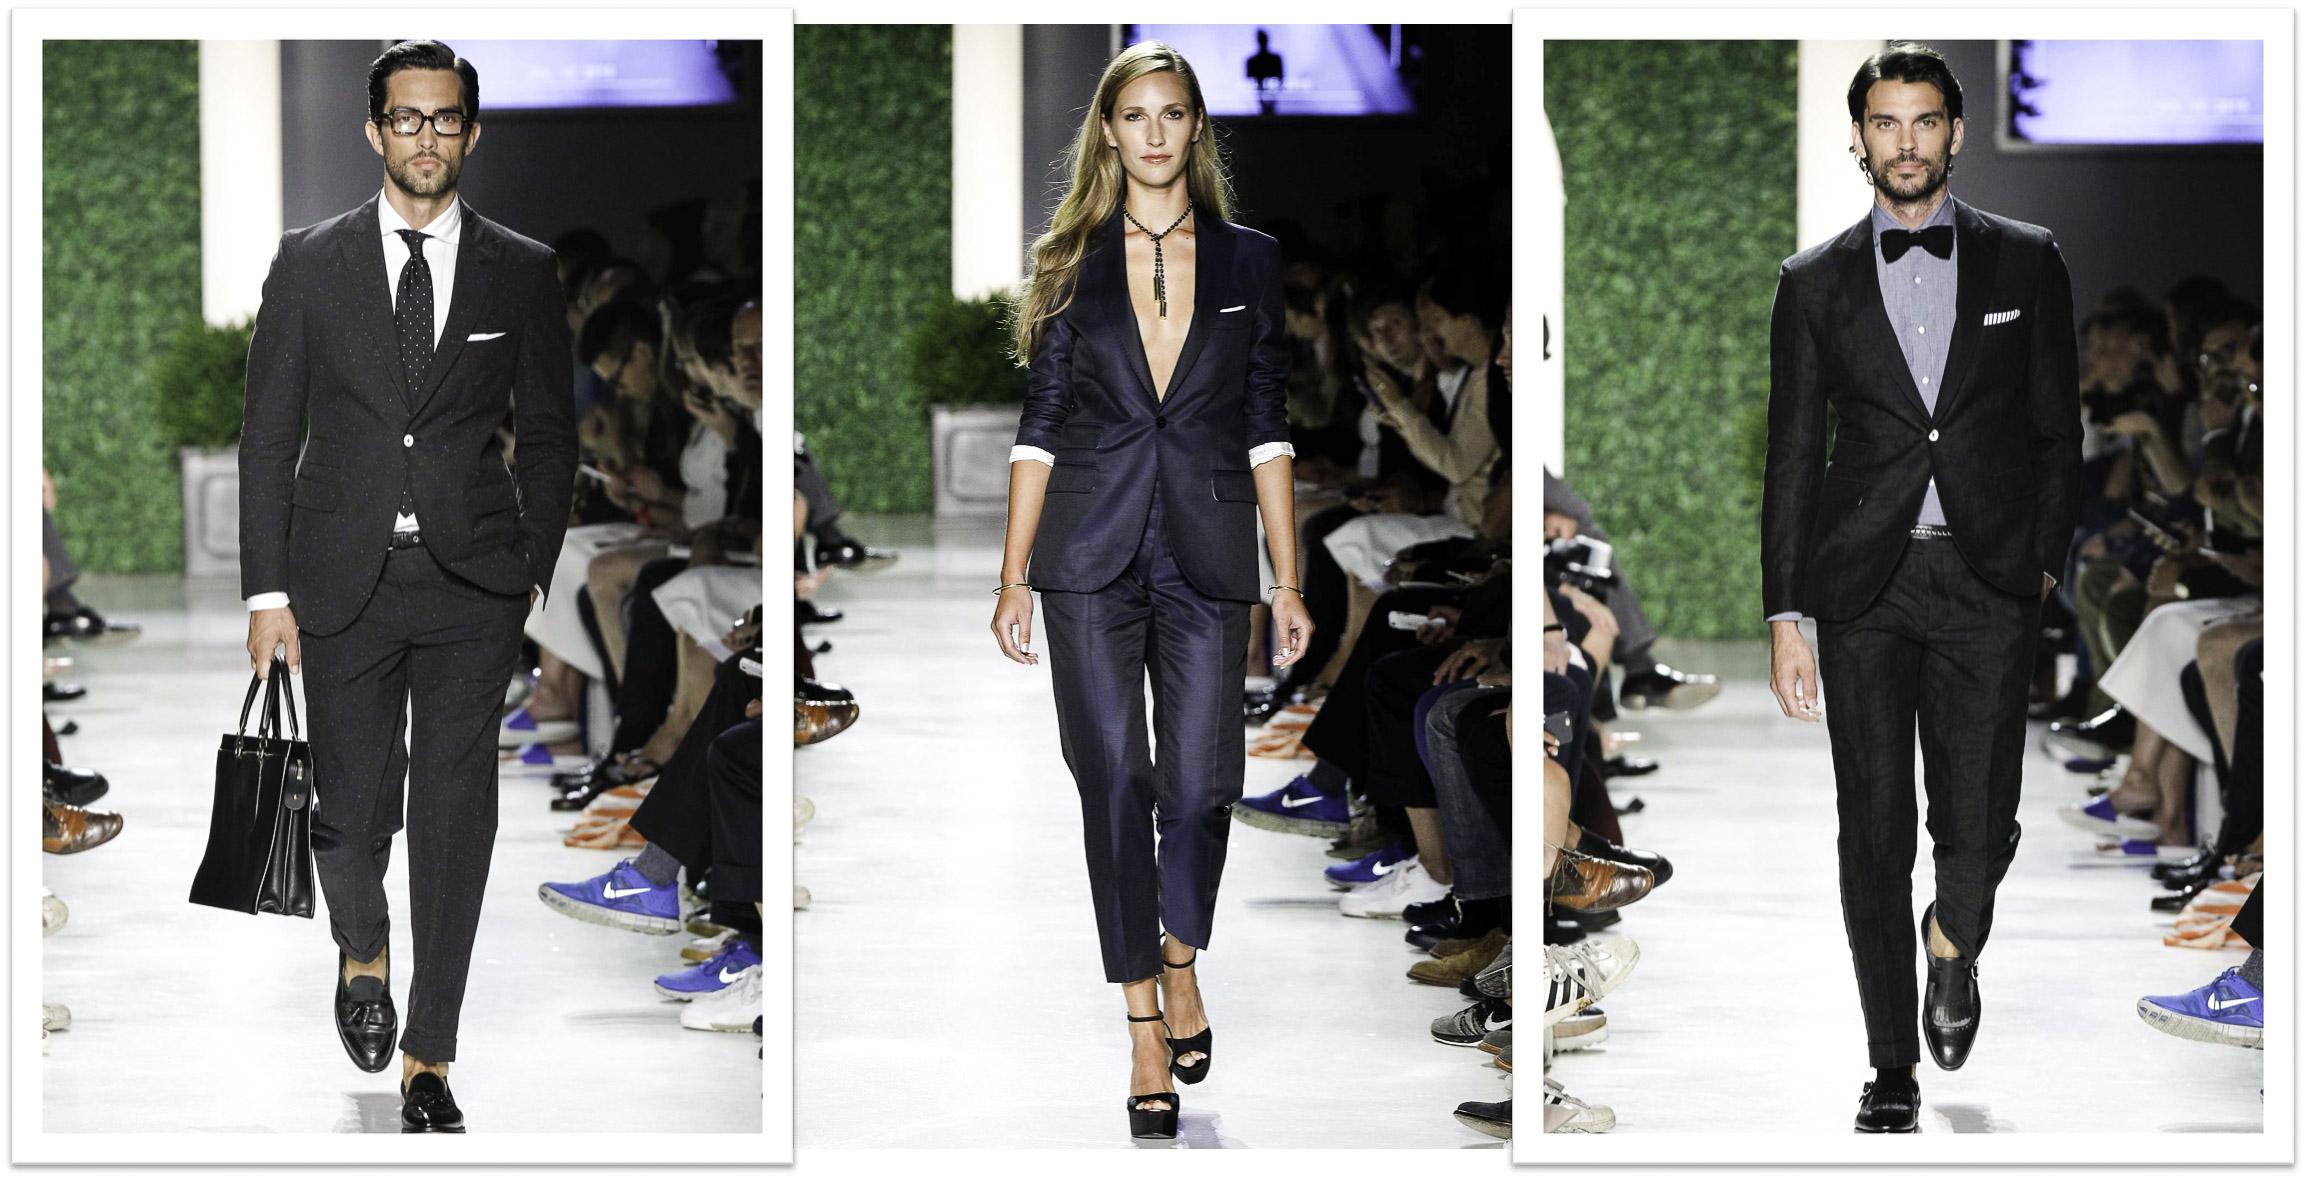 top-menswear-bloggers-2015_michael-bastian-spring-2016-menswear_top-fashion-bloggers-melbourne-australia-4